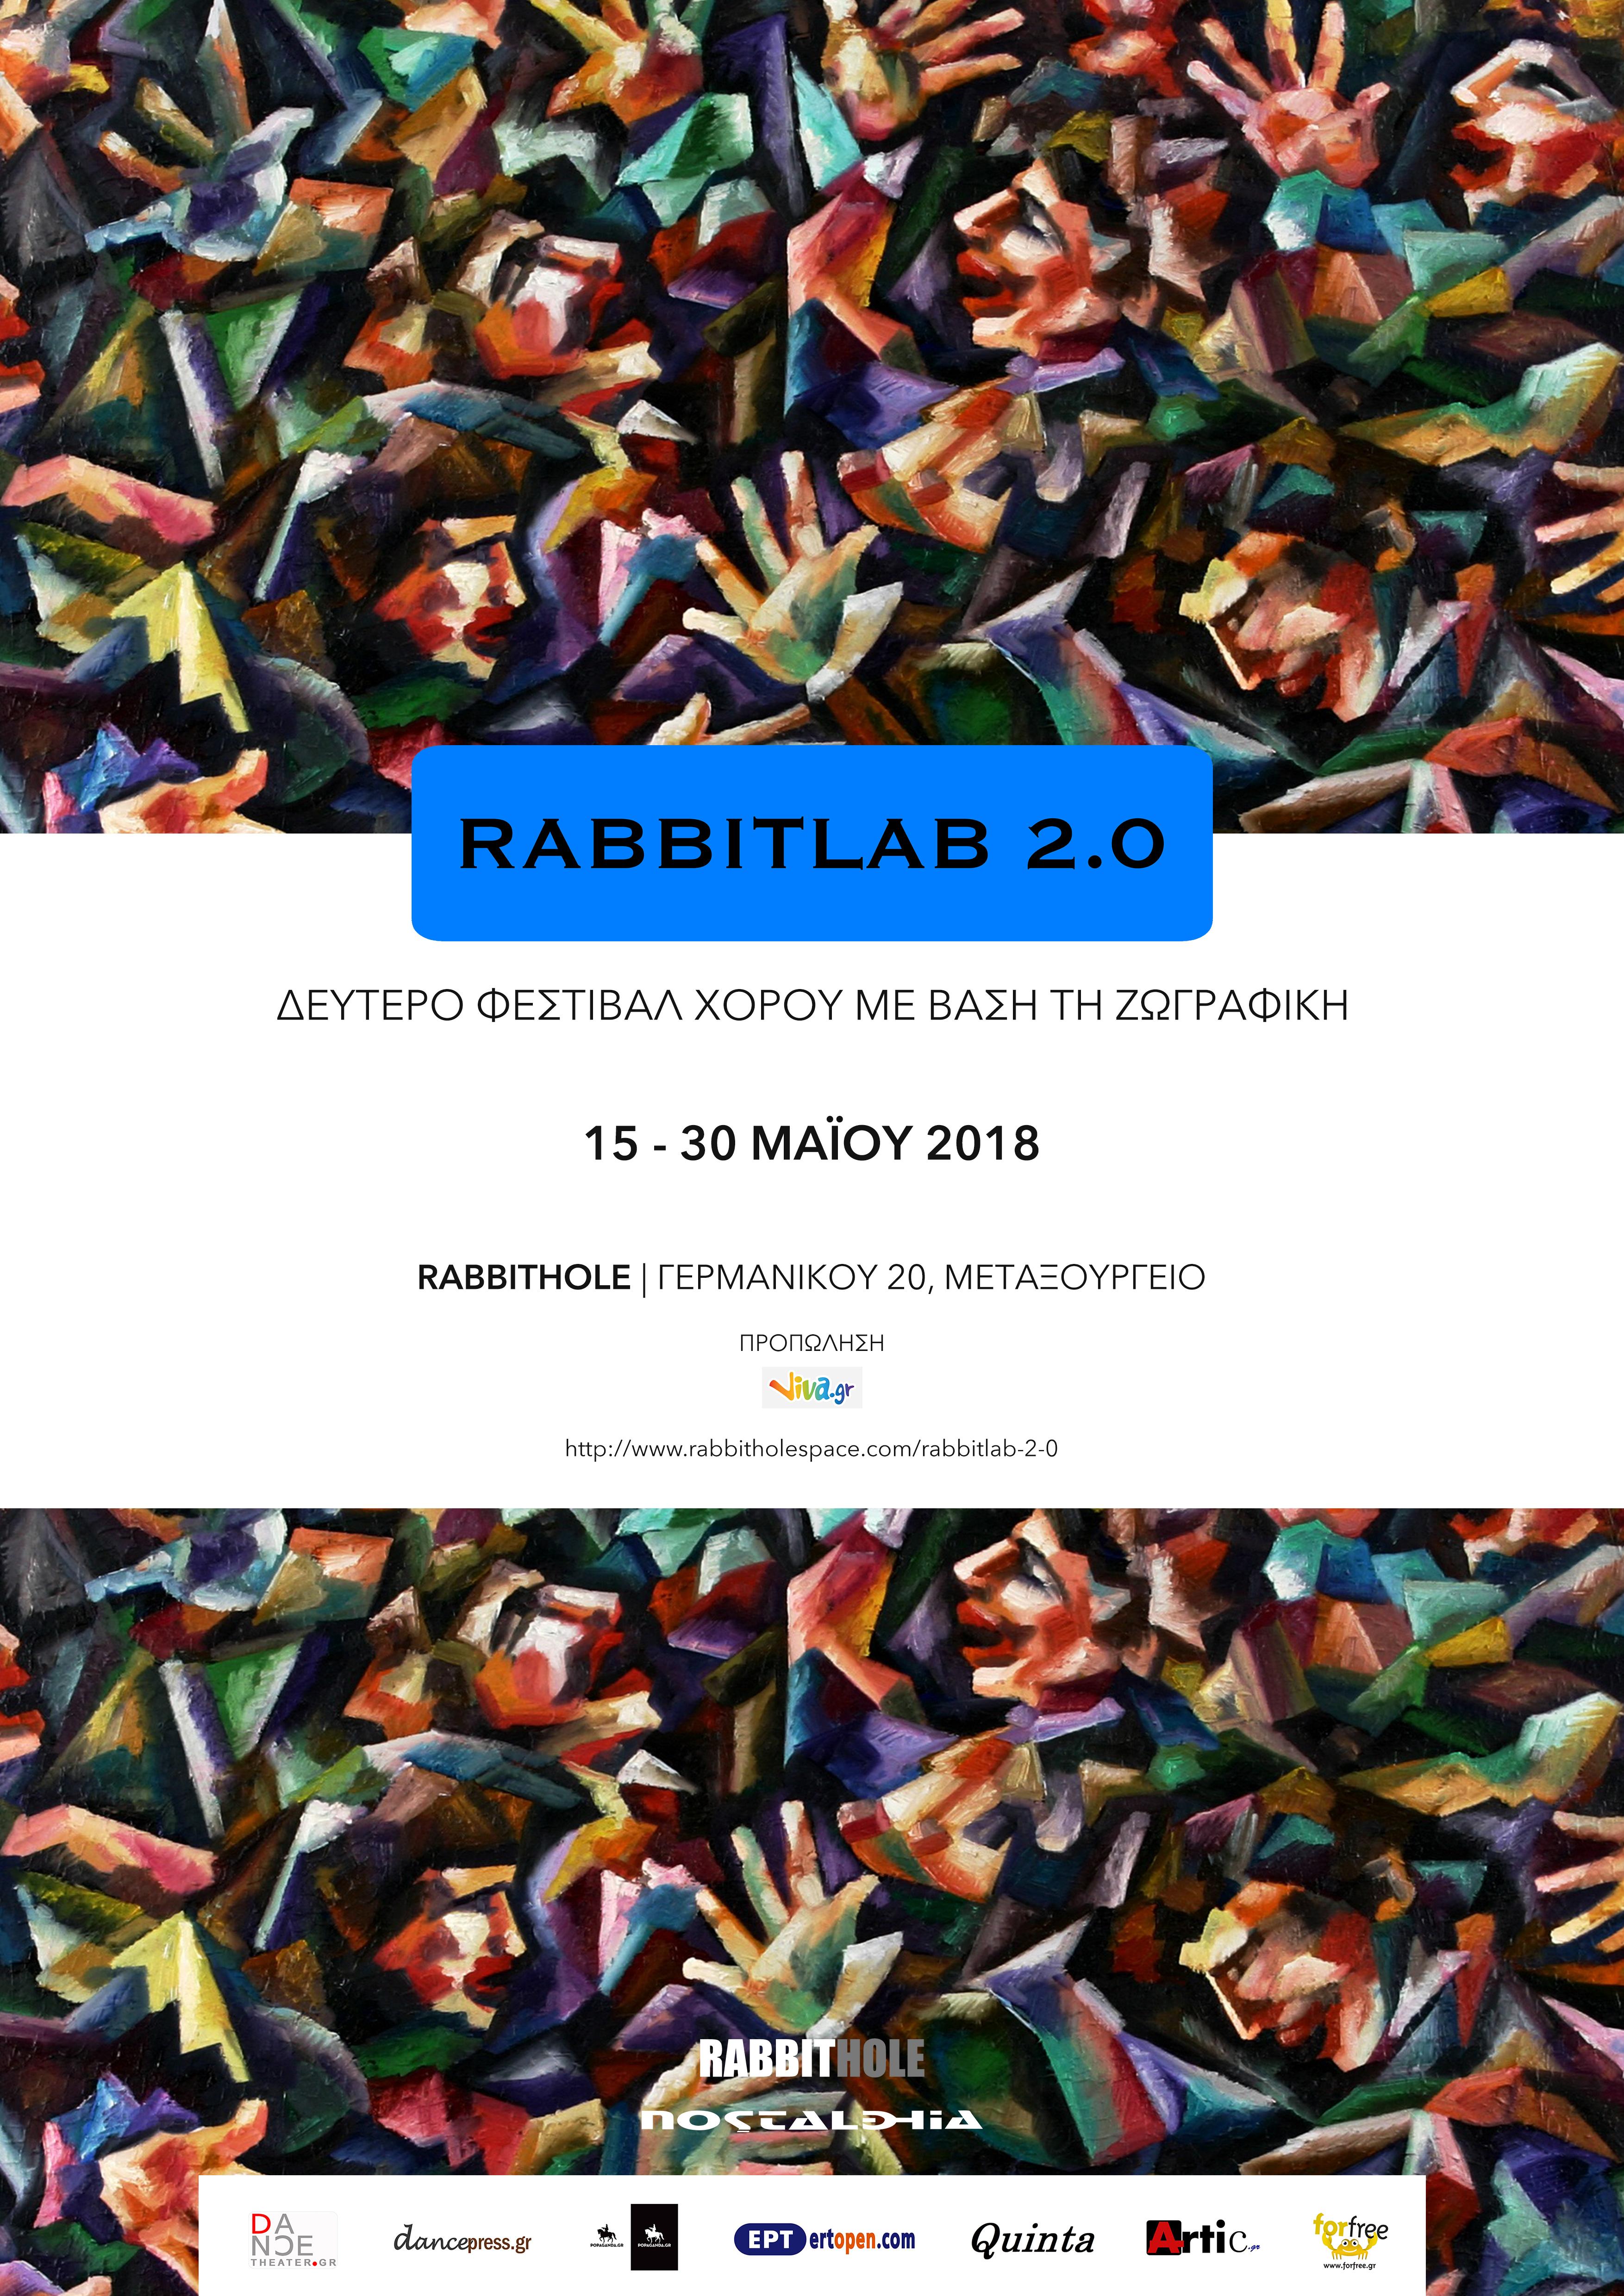 RABBITLAB 2.0